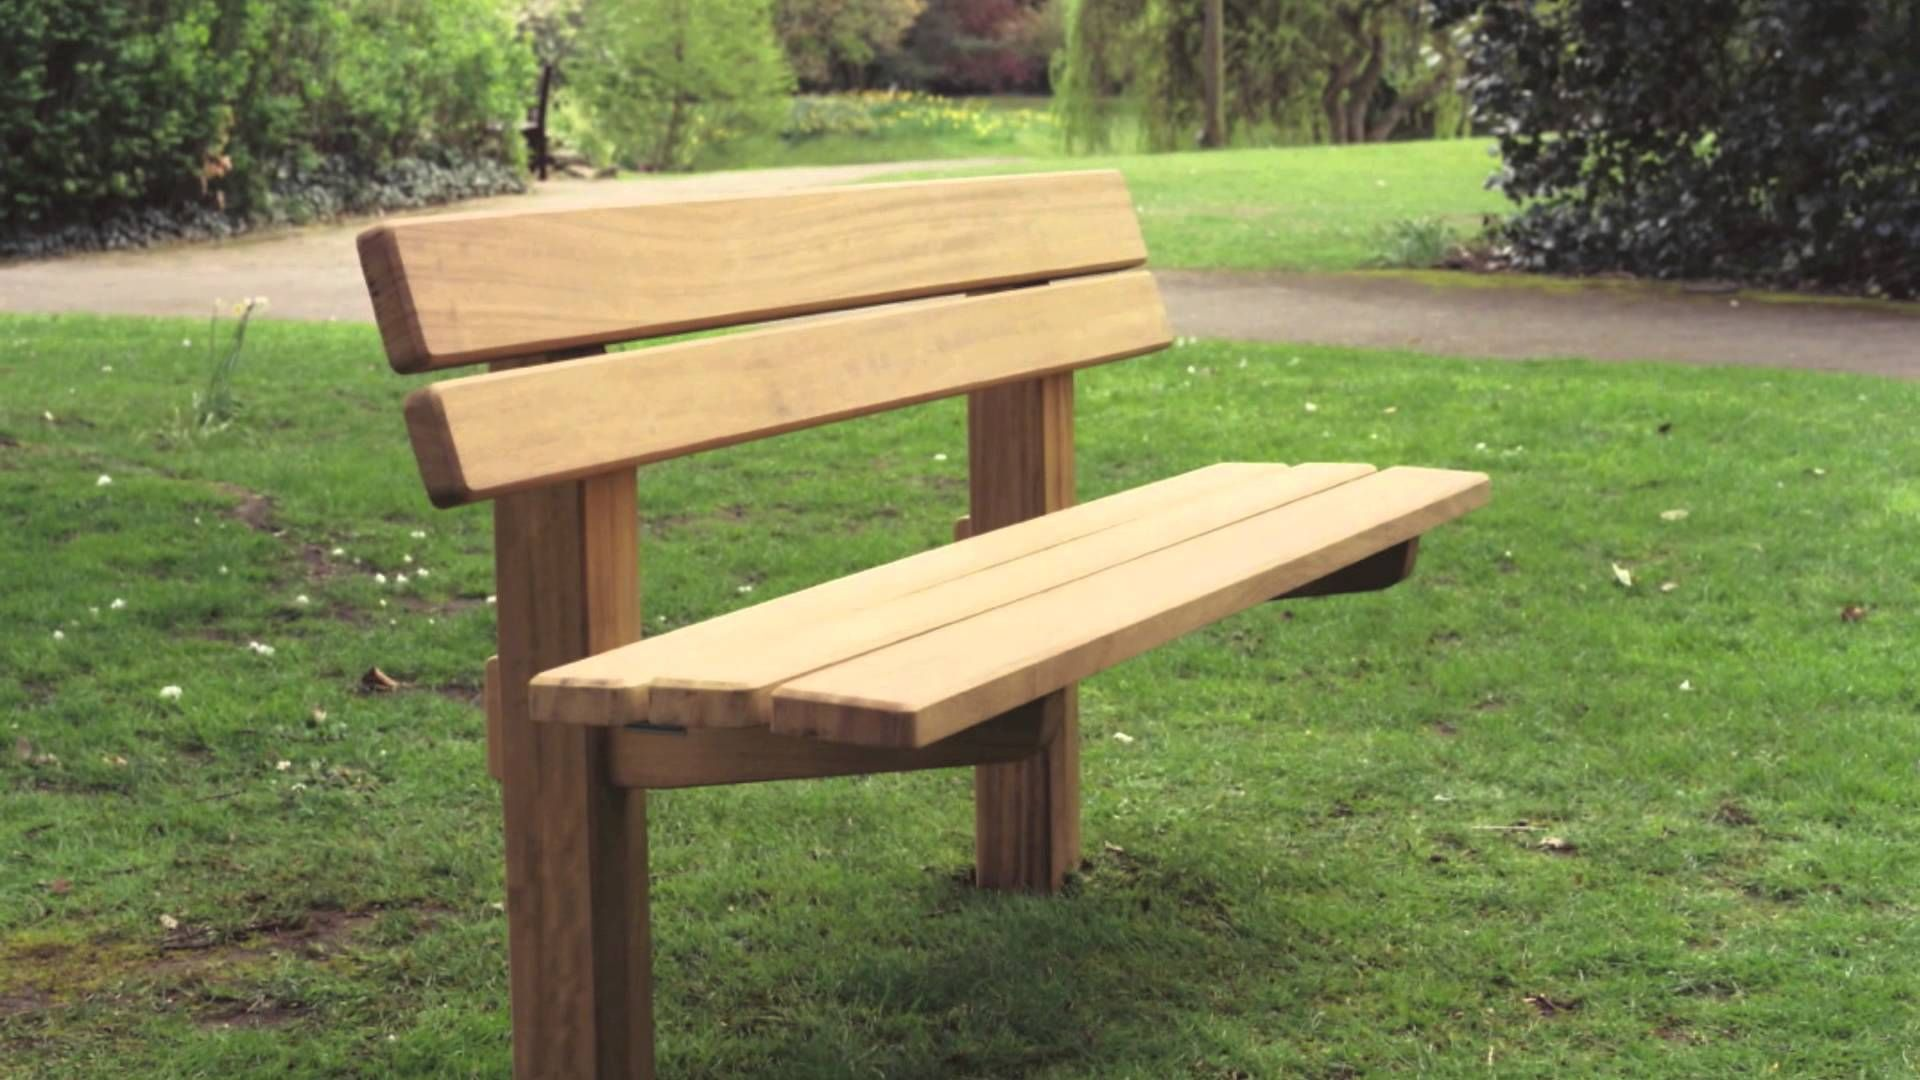 Wooden Park Bench Plans Wooden Garden Benches Park Bench Diy Wooden Park Bench